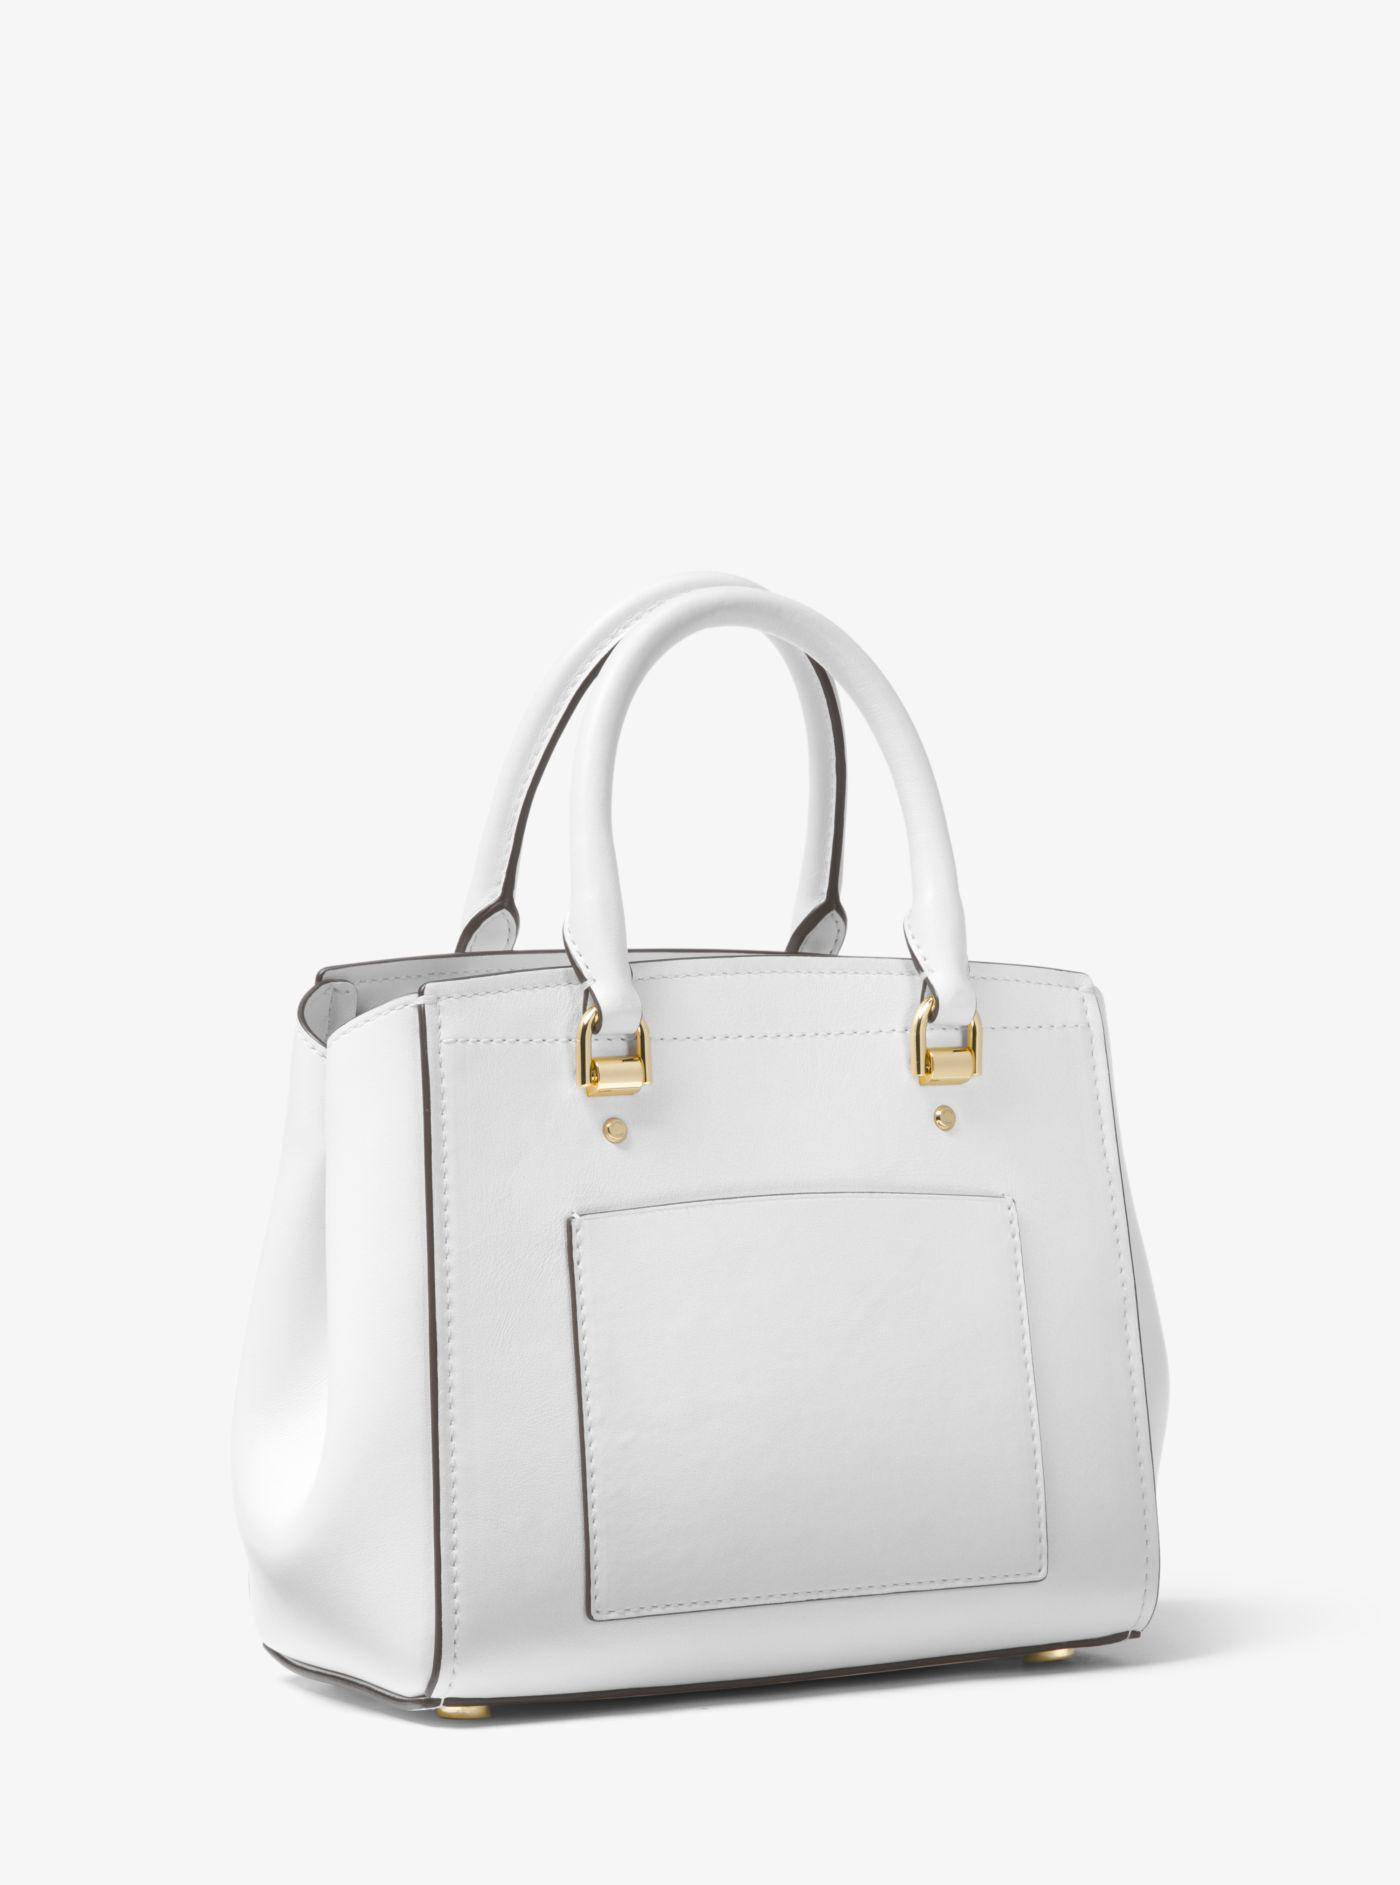 ece36a46fe2c Lyst - Michael Kors Benning Medium Leather Satchel in White